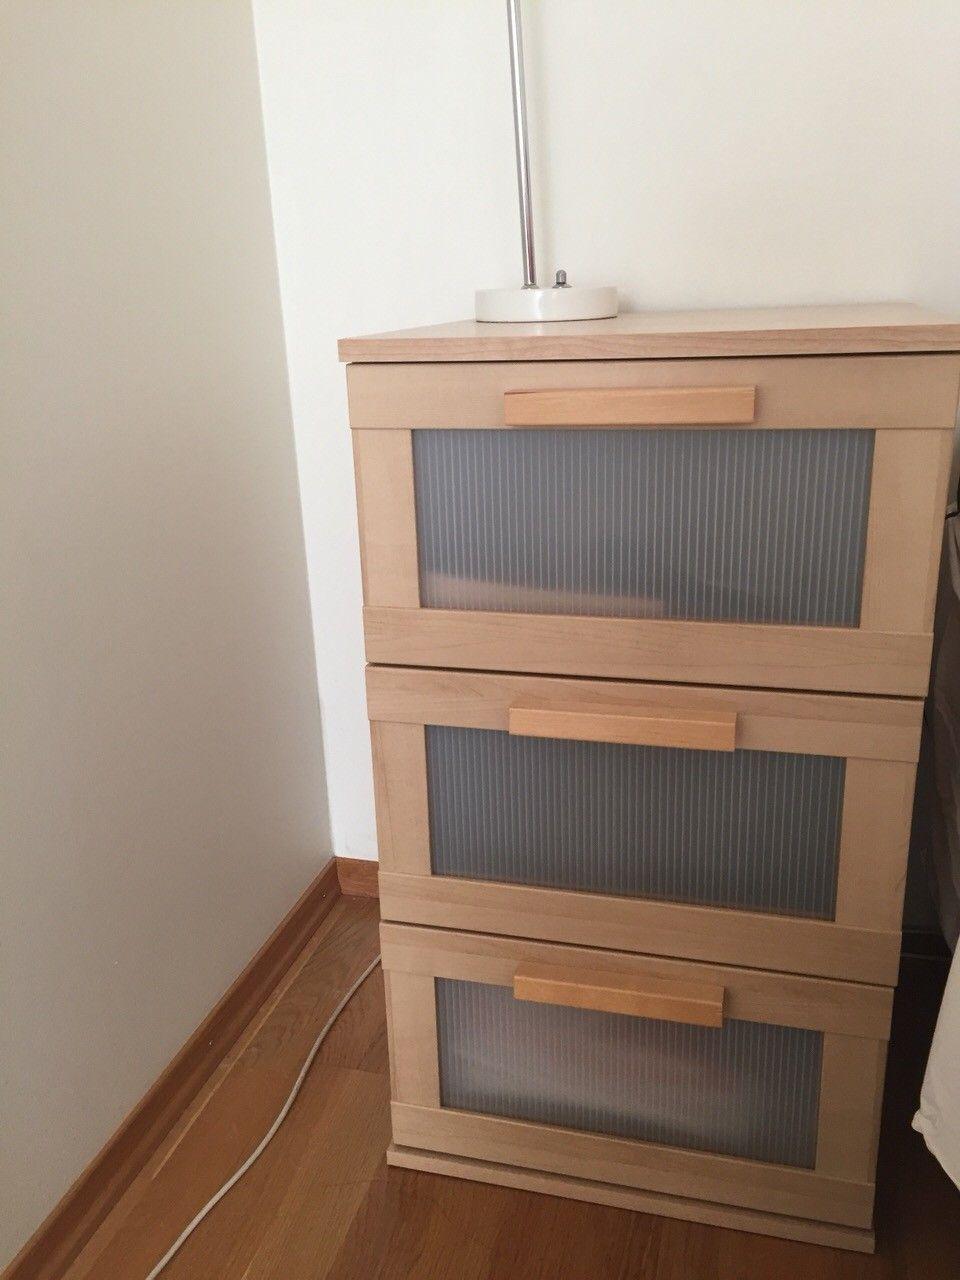 Aneboda Ikea nattbord - Lillestrøm  - Aneboda Ikea nattbord i god stand med 3 stk skuffer. 4 stk bein medfølger også.  Mål: Høyde:81cm. med bein, bredde:40, dybde:40 - Lillestrøm